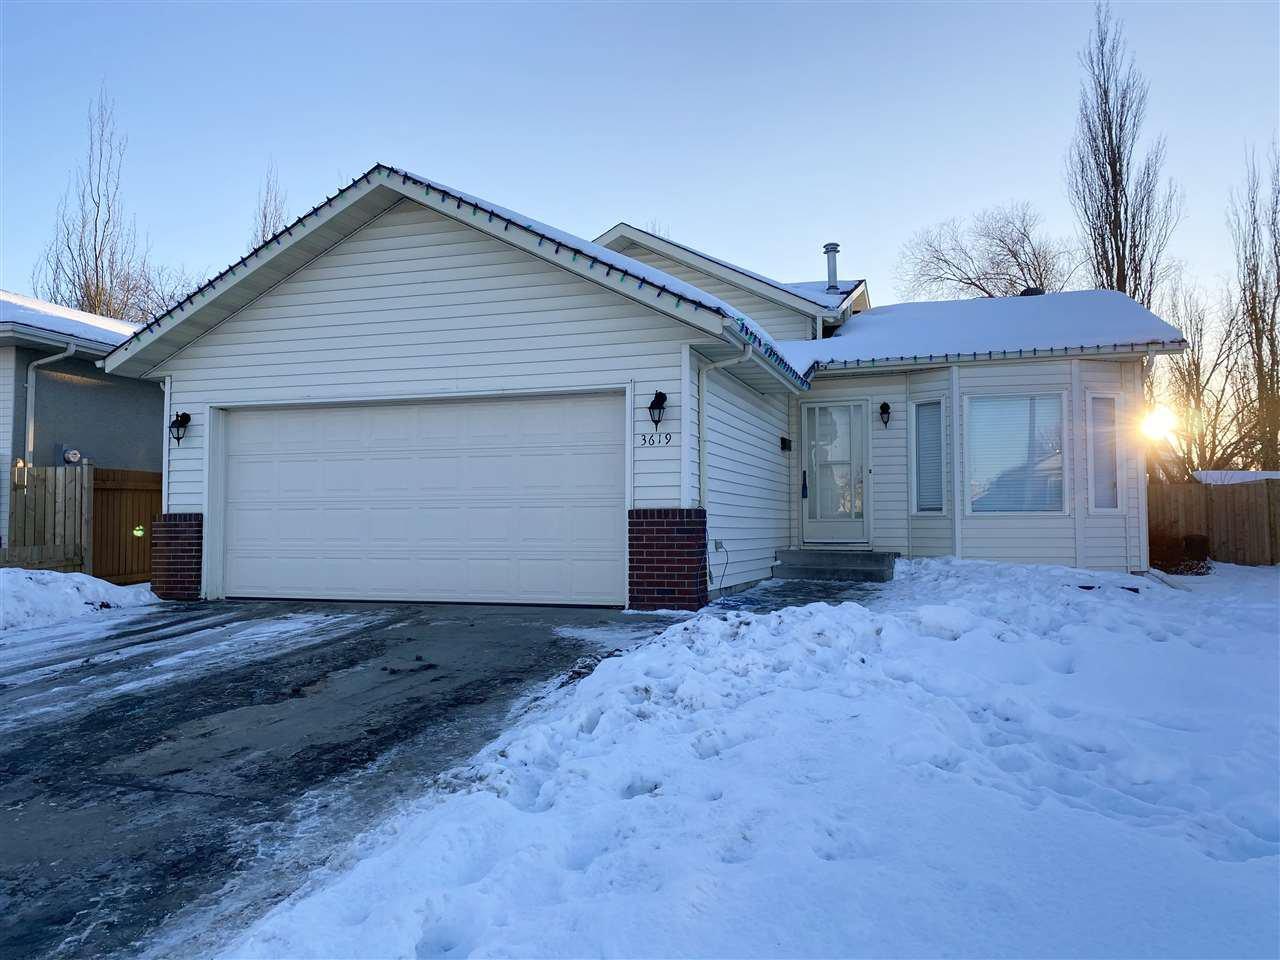 Main Photo: 3619 146 Avenue in Edmonton: Zone 35 House for sale : MLS®# E4186205